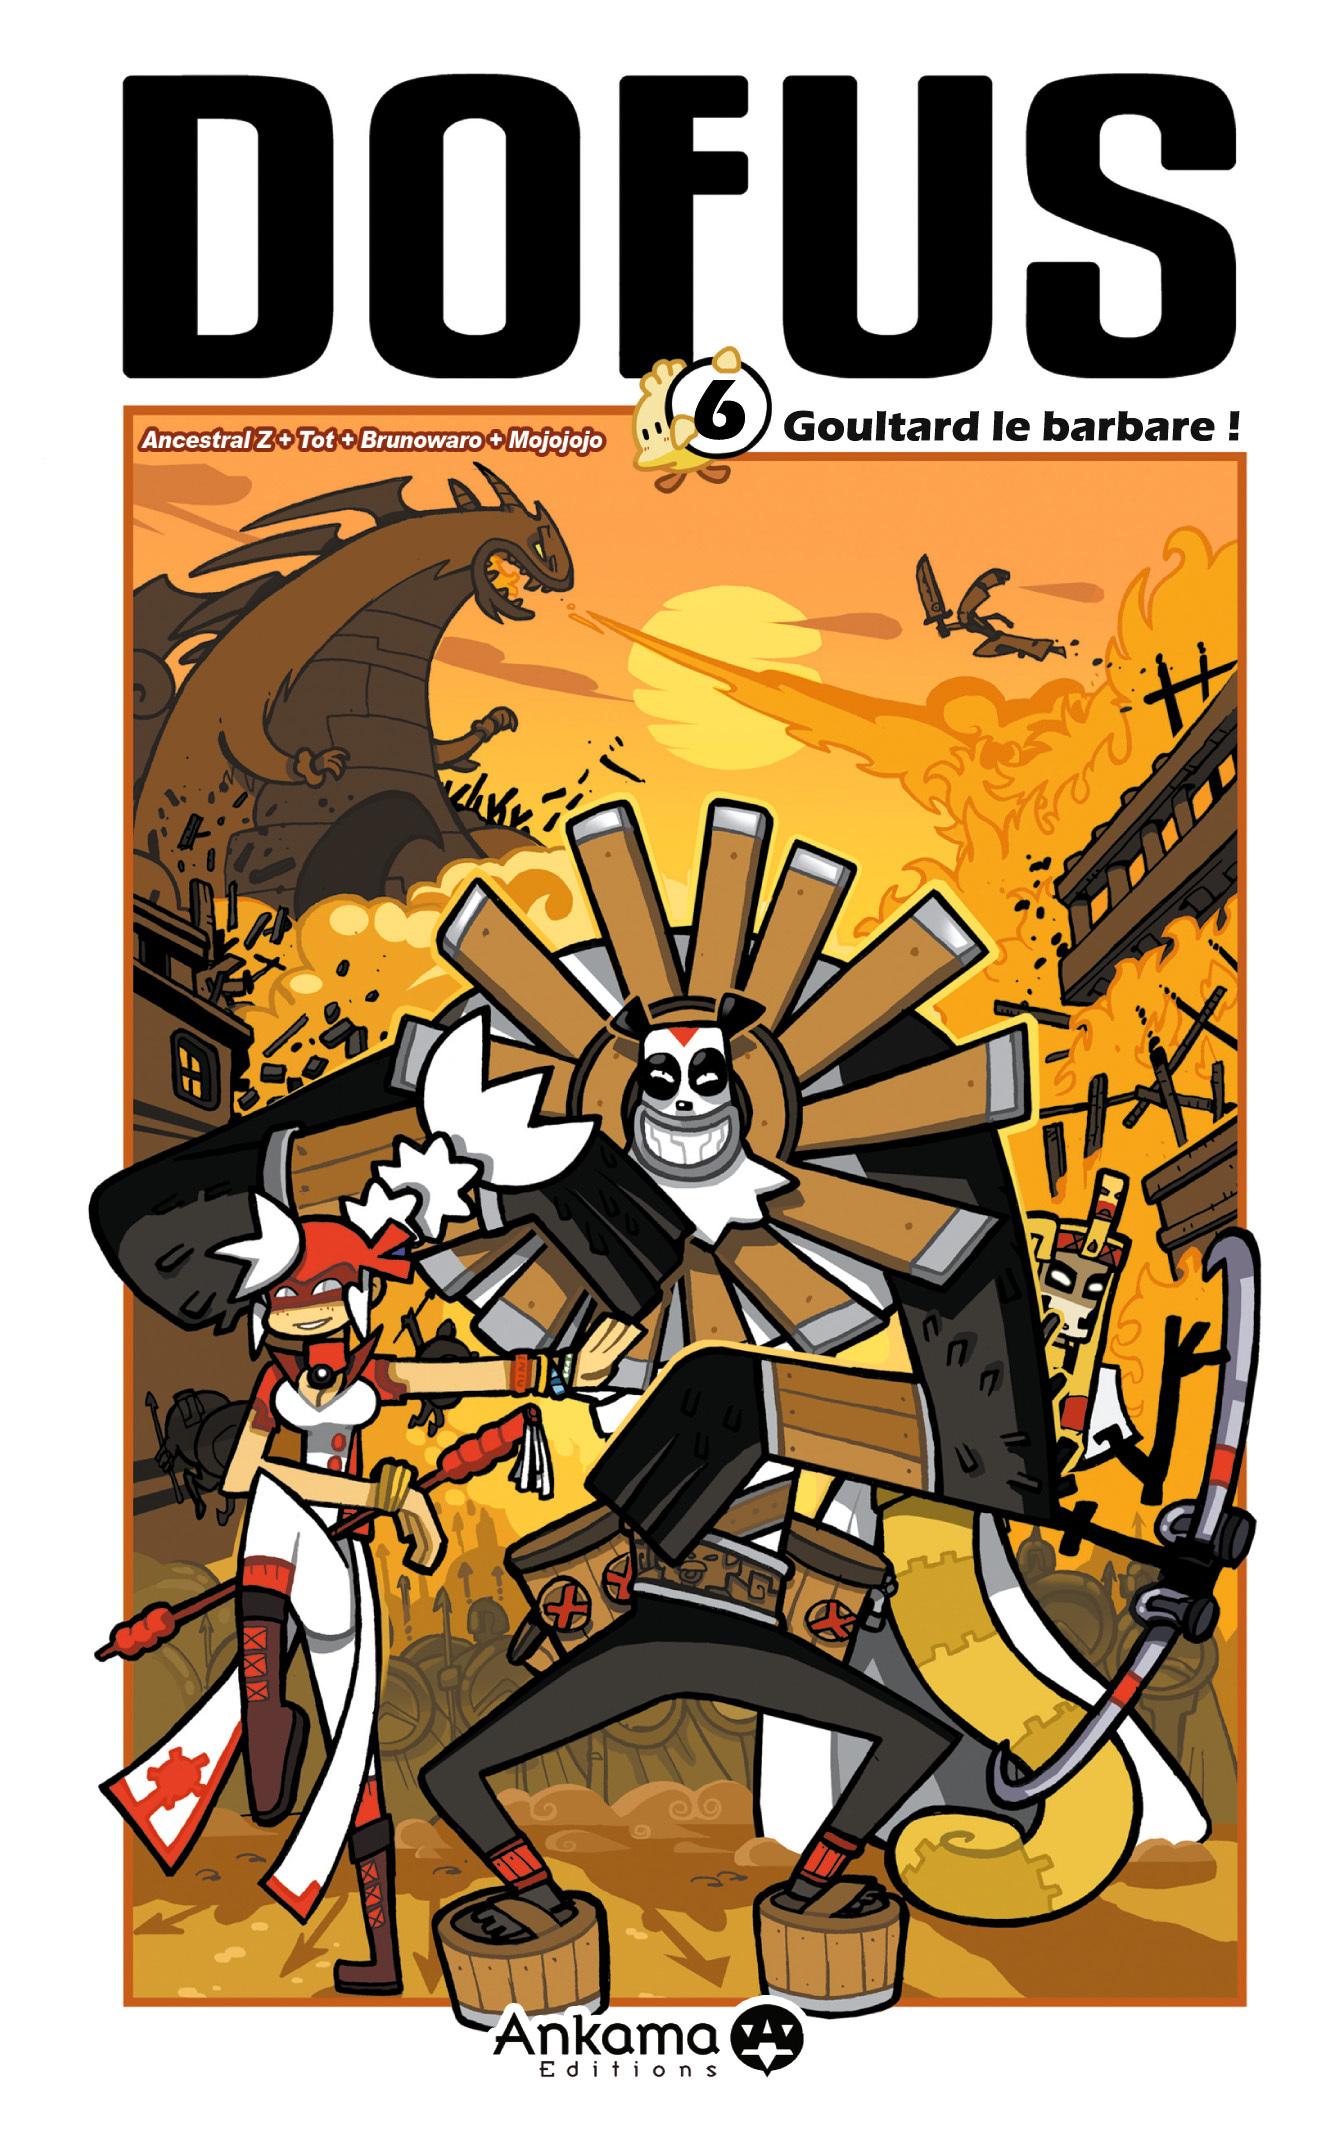 DOFUS T06 GOULTARD LE BARBARE